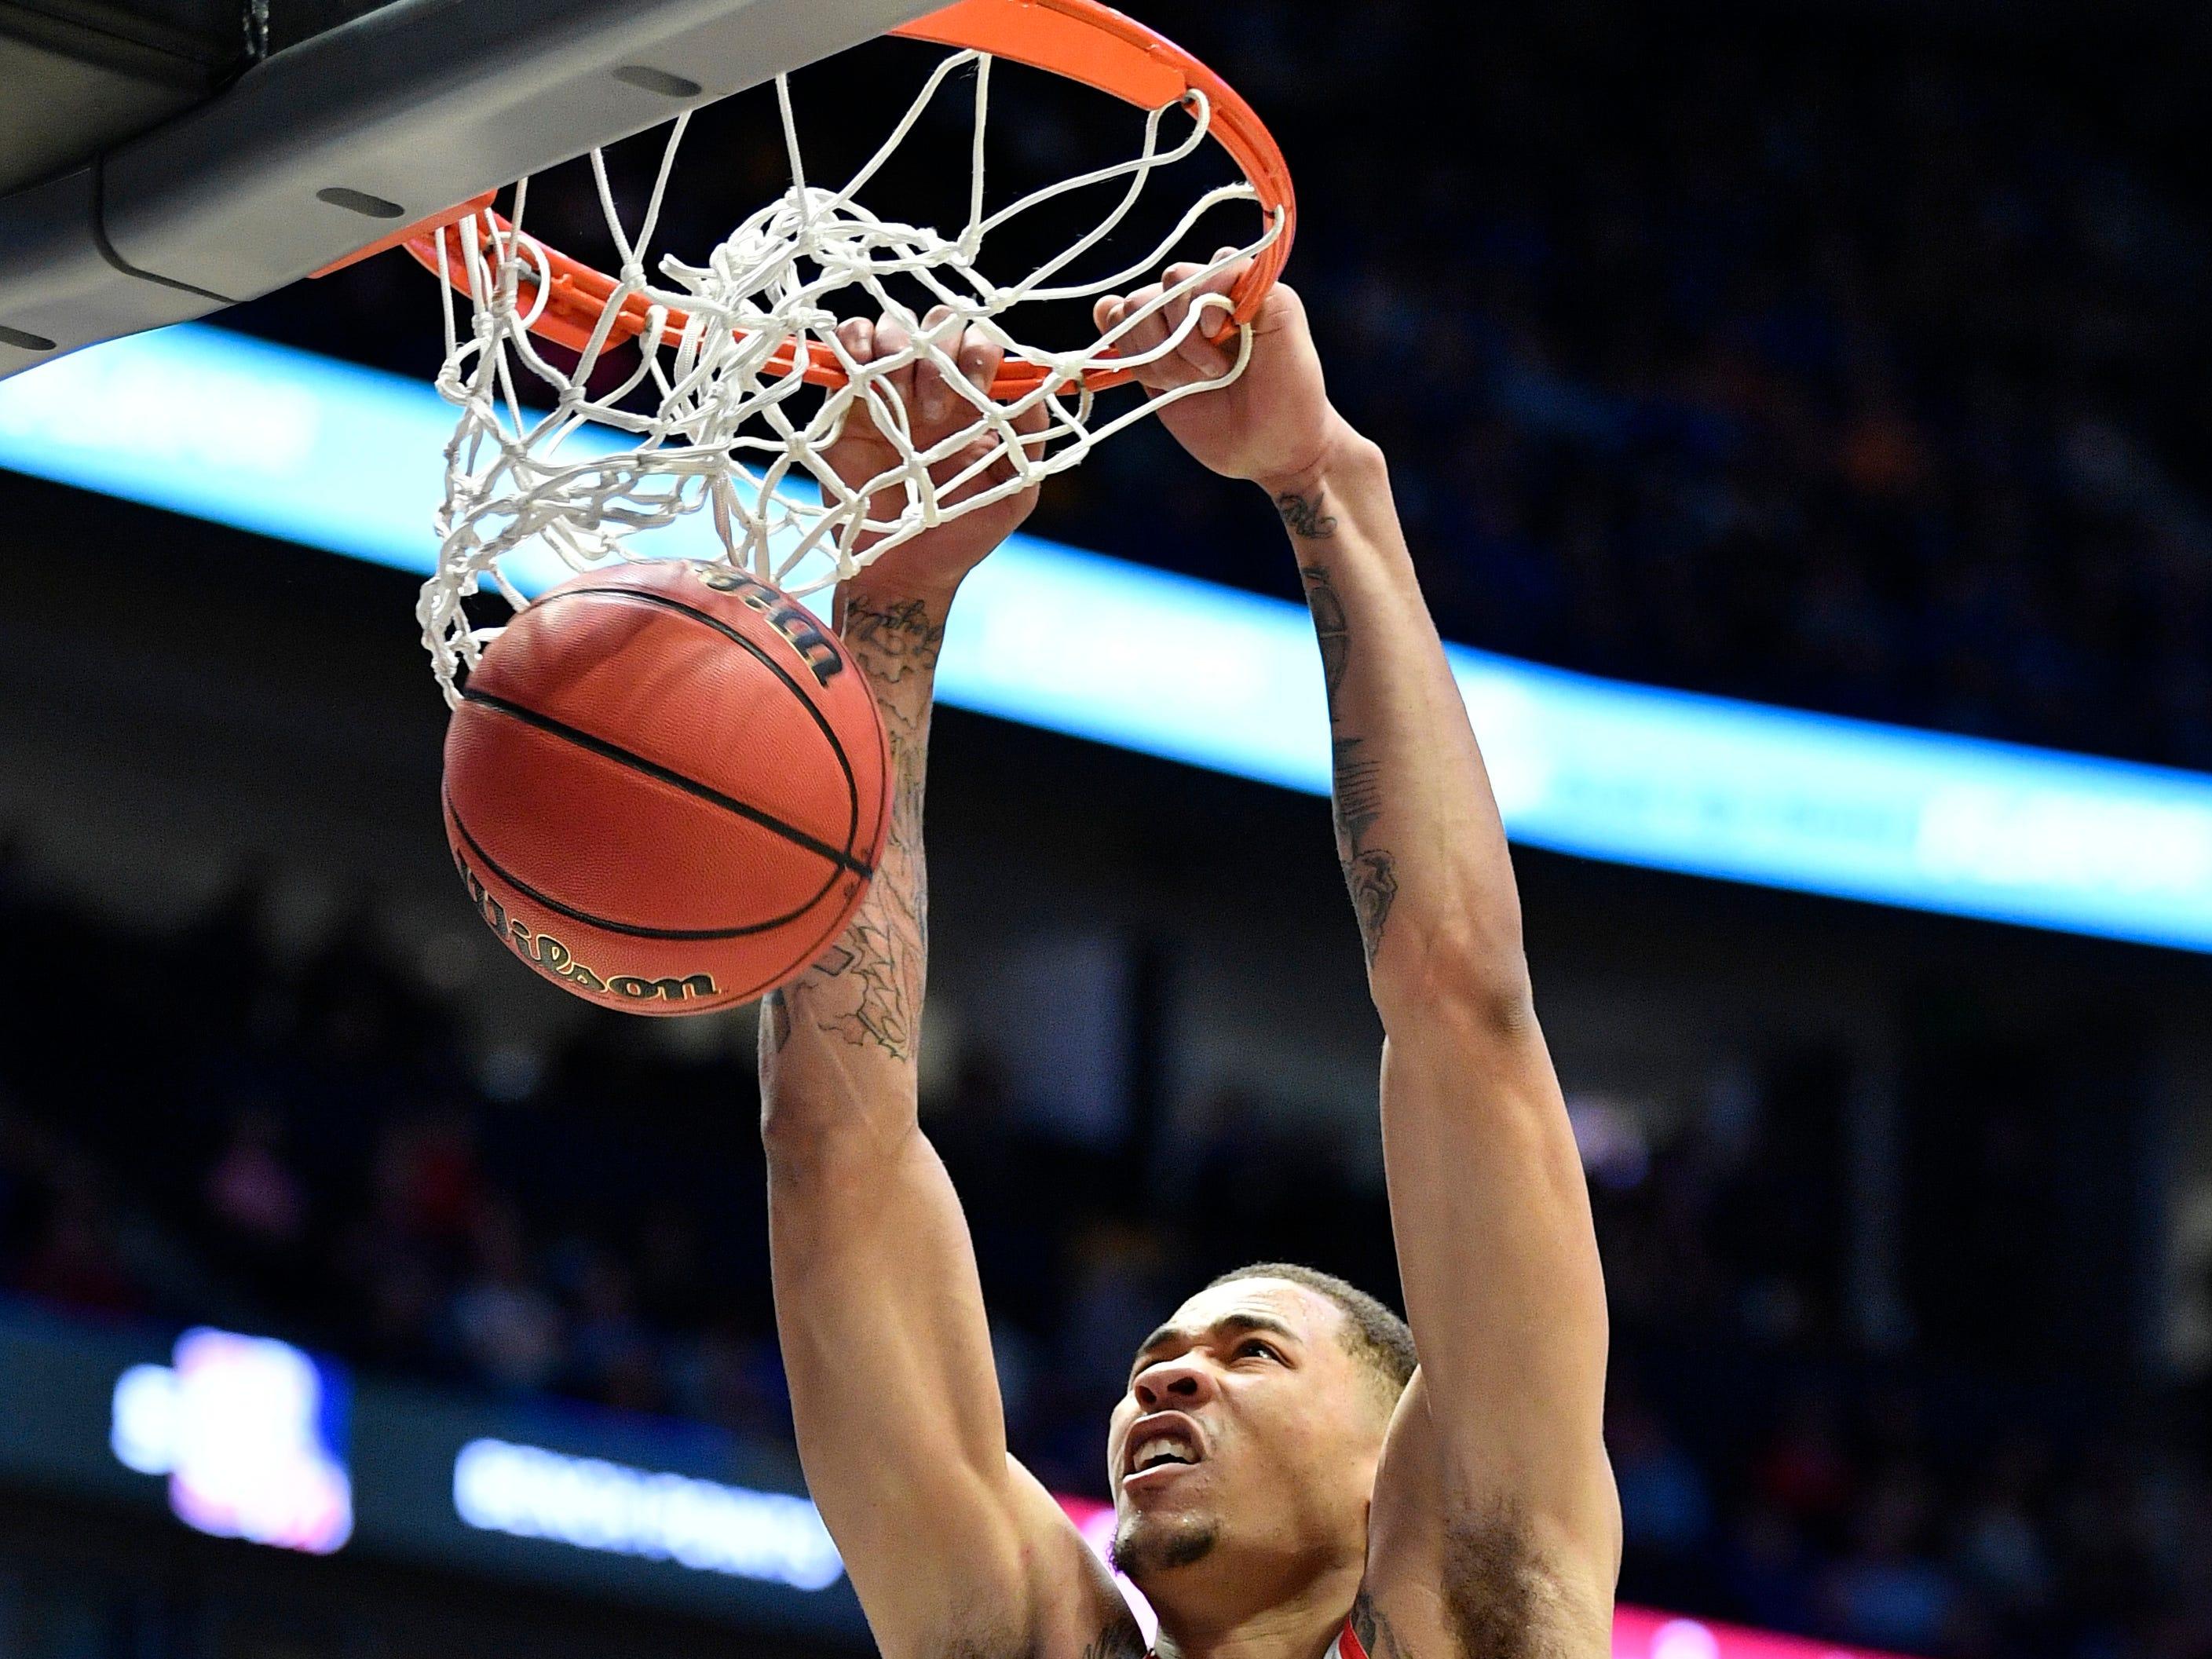 Ole Miss forward KJ Buffen (14) dunks during the second half of the SEC Men's Basketball Tournament game at Bridgestone Arena in Nashville, Tenn., Thursday, March 14, 2019.